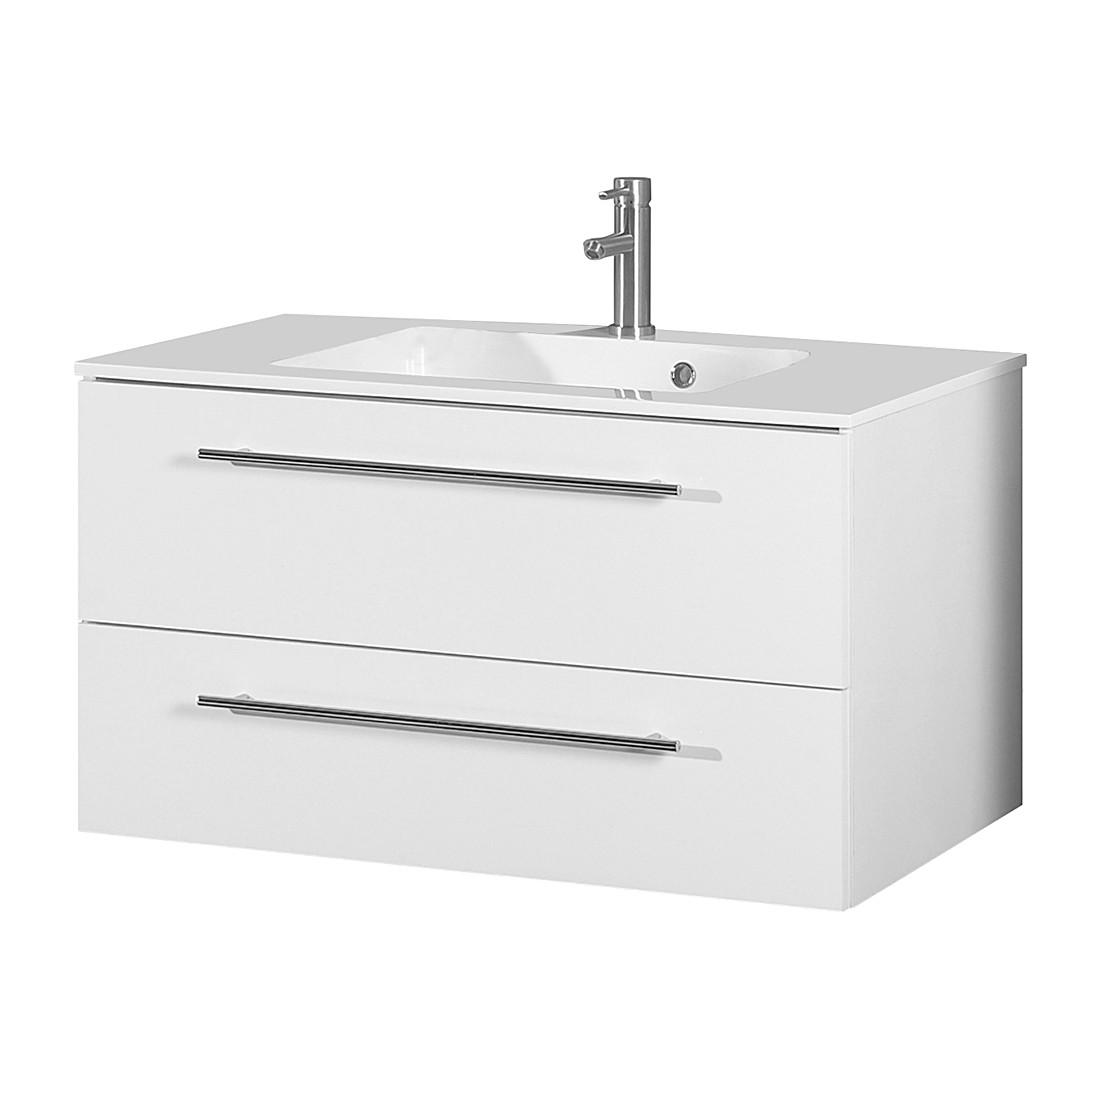 Home 24 - Meuble lavabo bern iii - blanc, schildmeyer